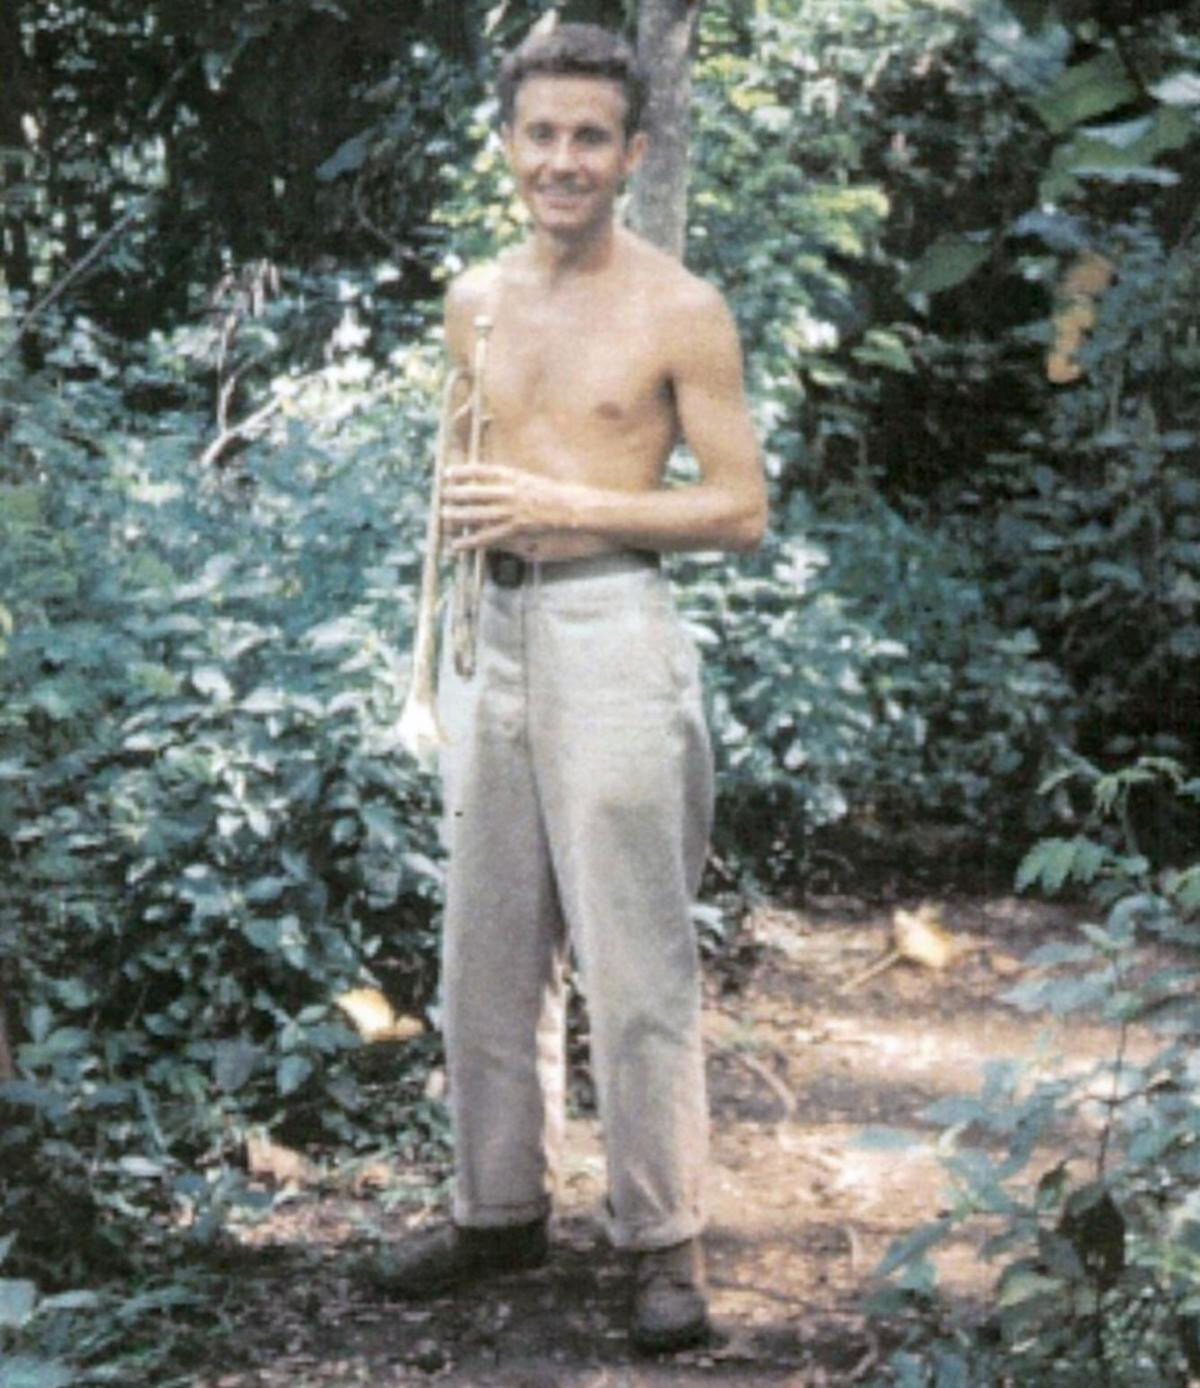 PFC Richard Burt Luzon jungle